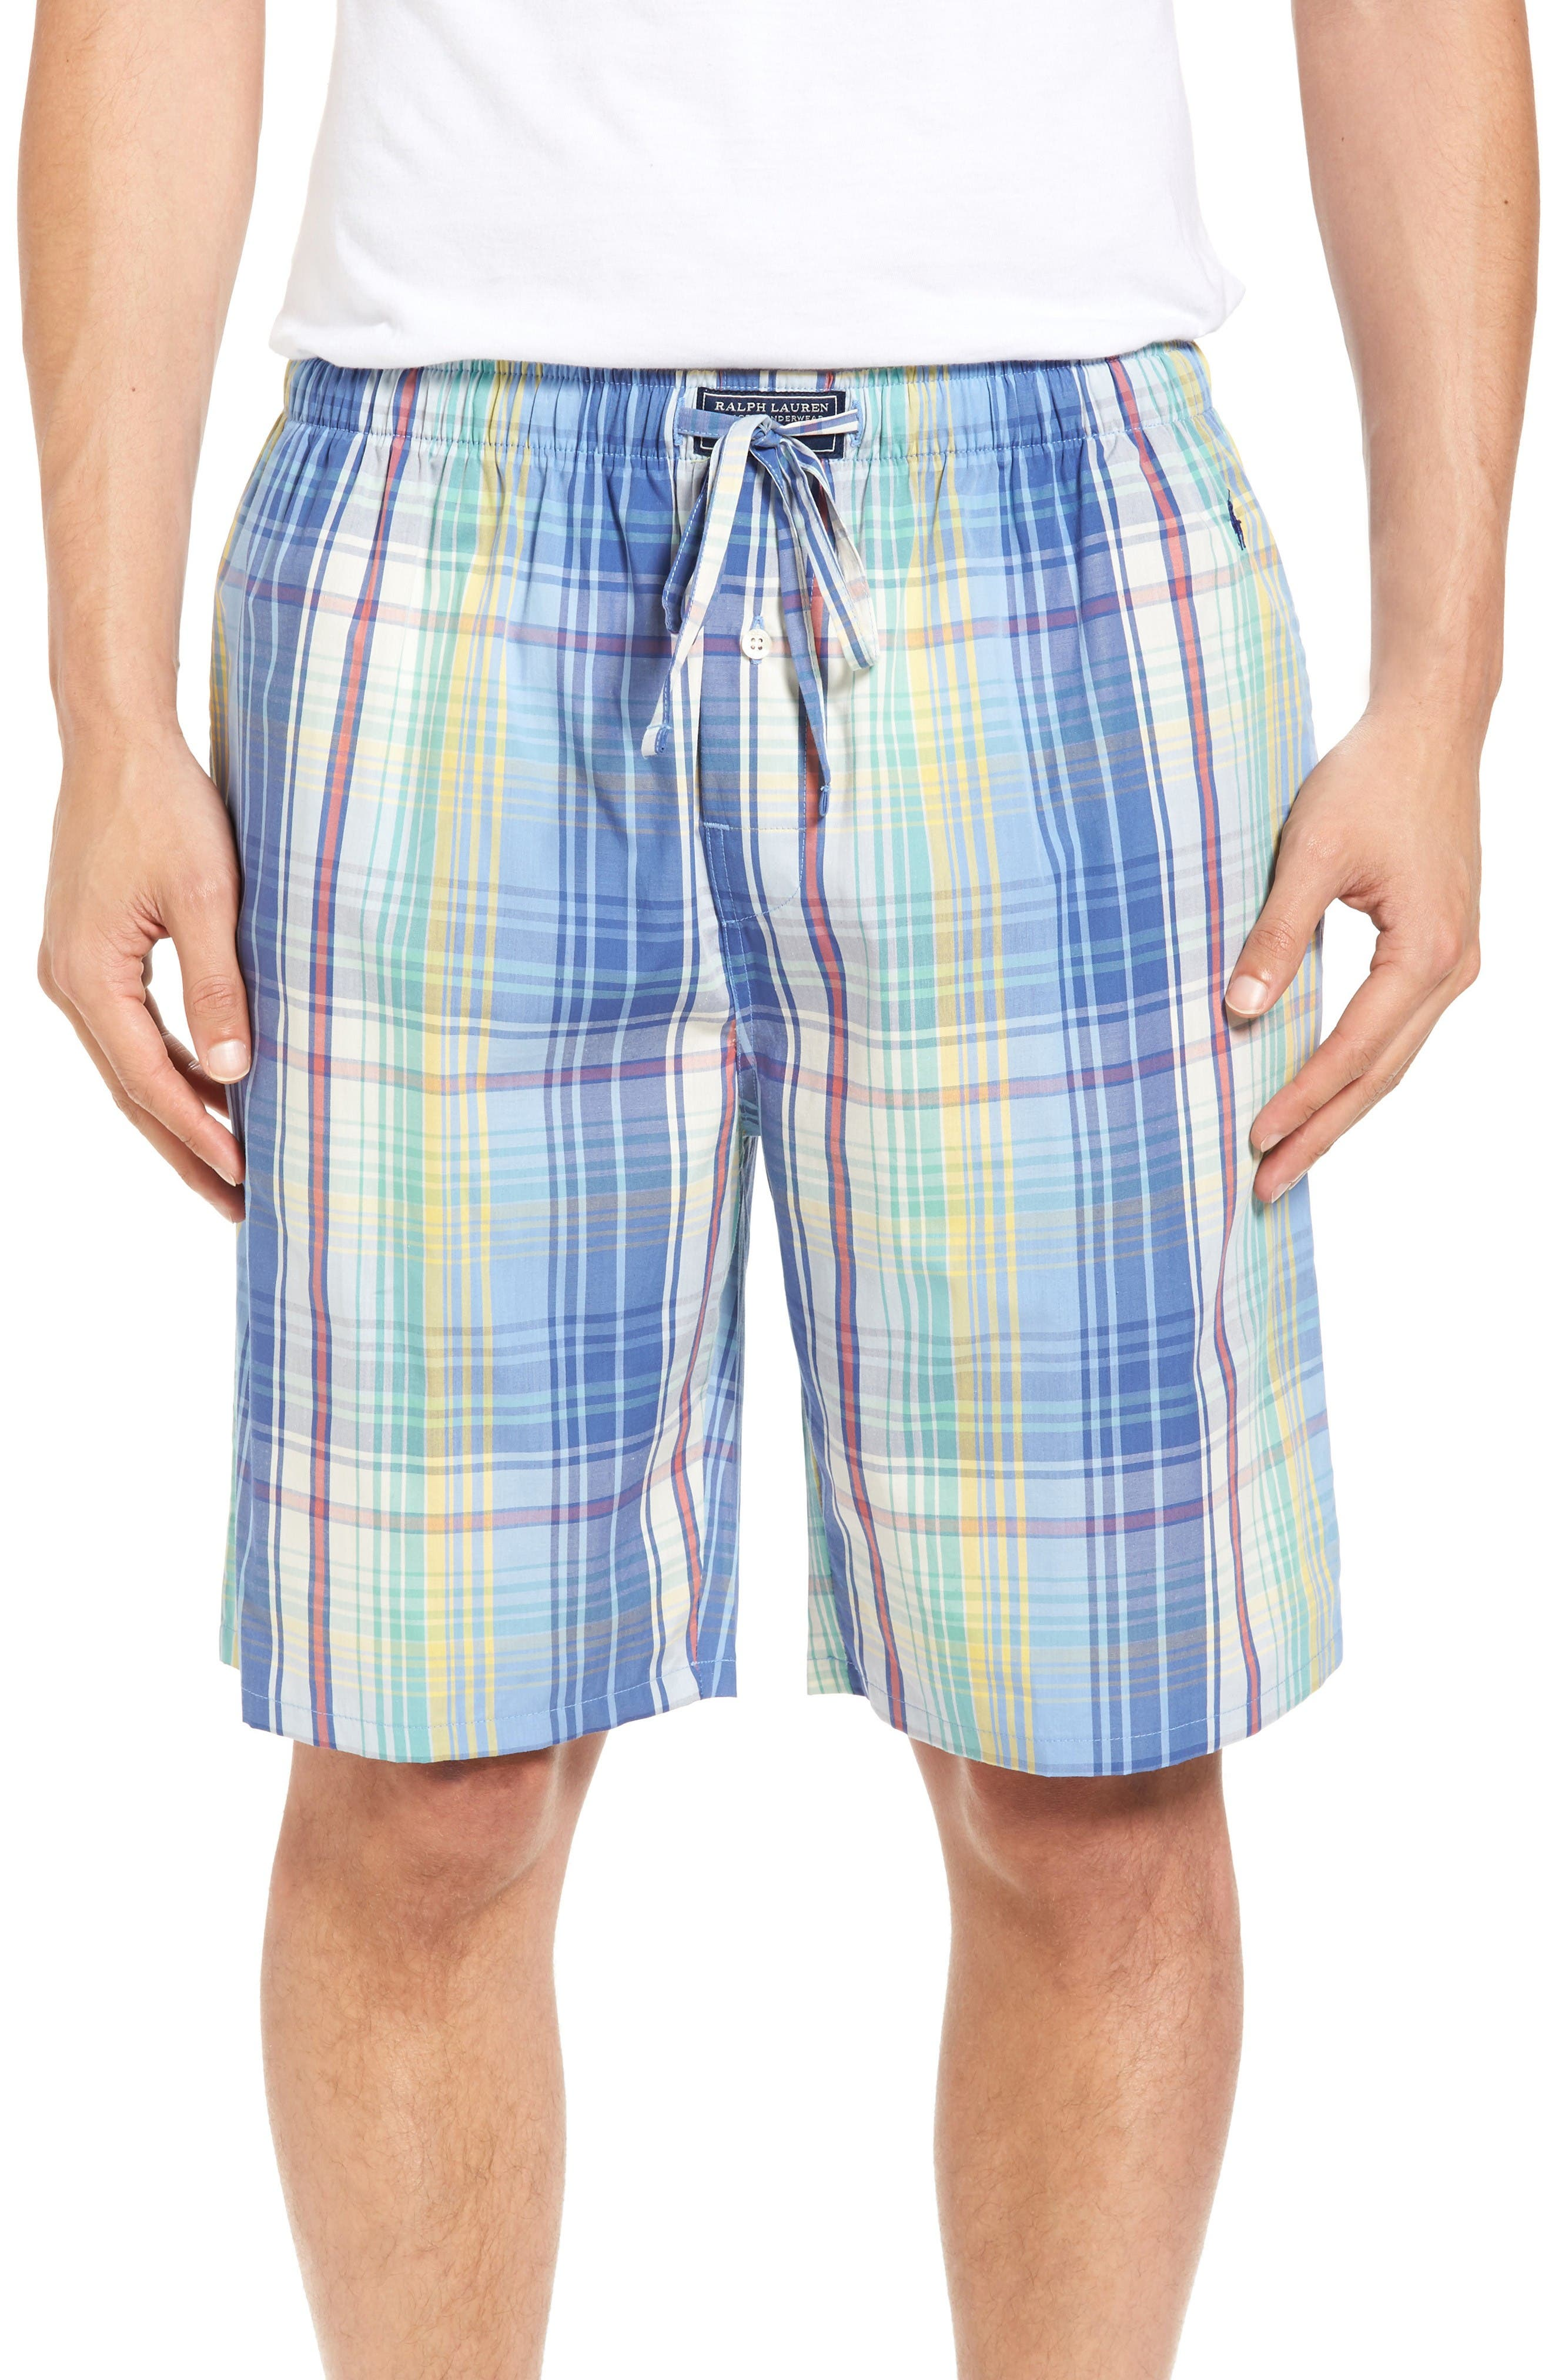 Cotton Pajama Shorts,                             Main thumbnail 1, color,                             Avery Plaid